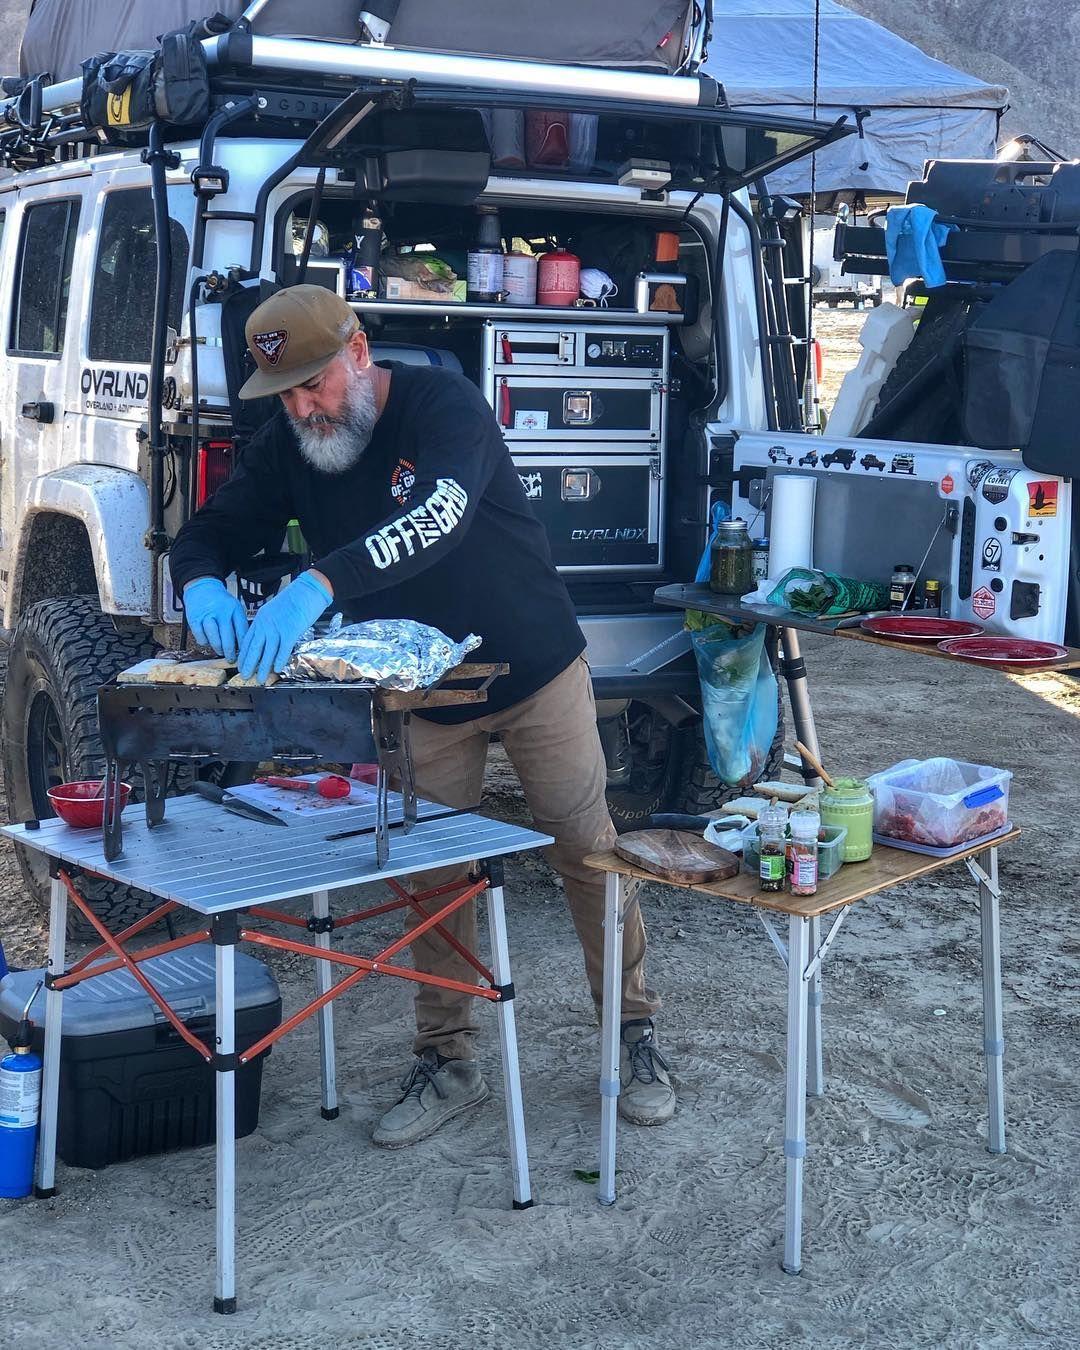 Great little overlanding kitchen set up. Truck bed